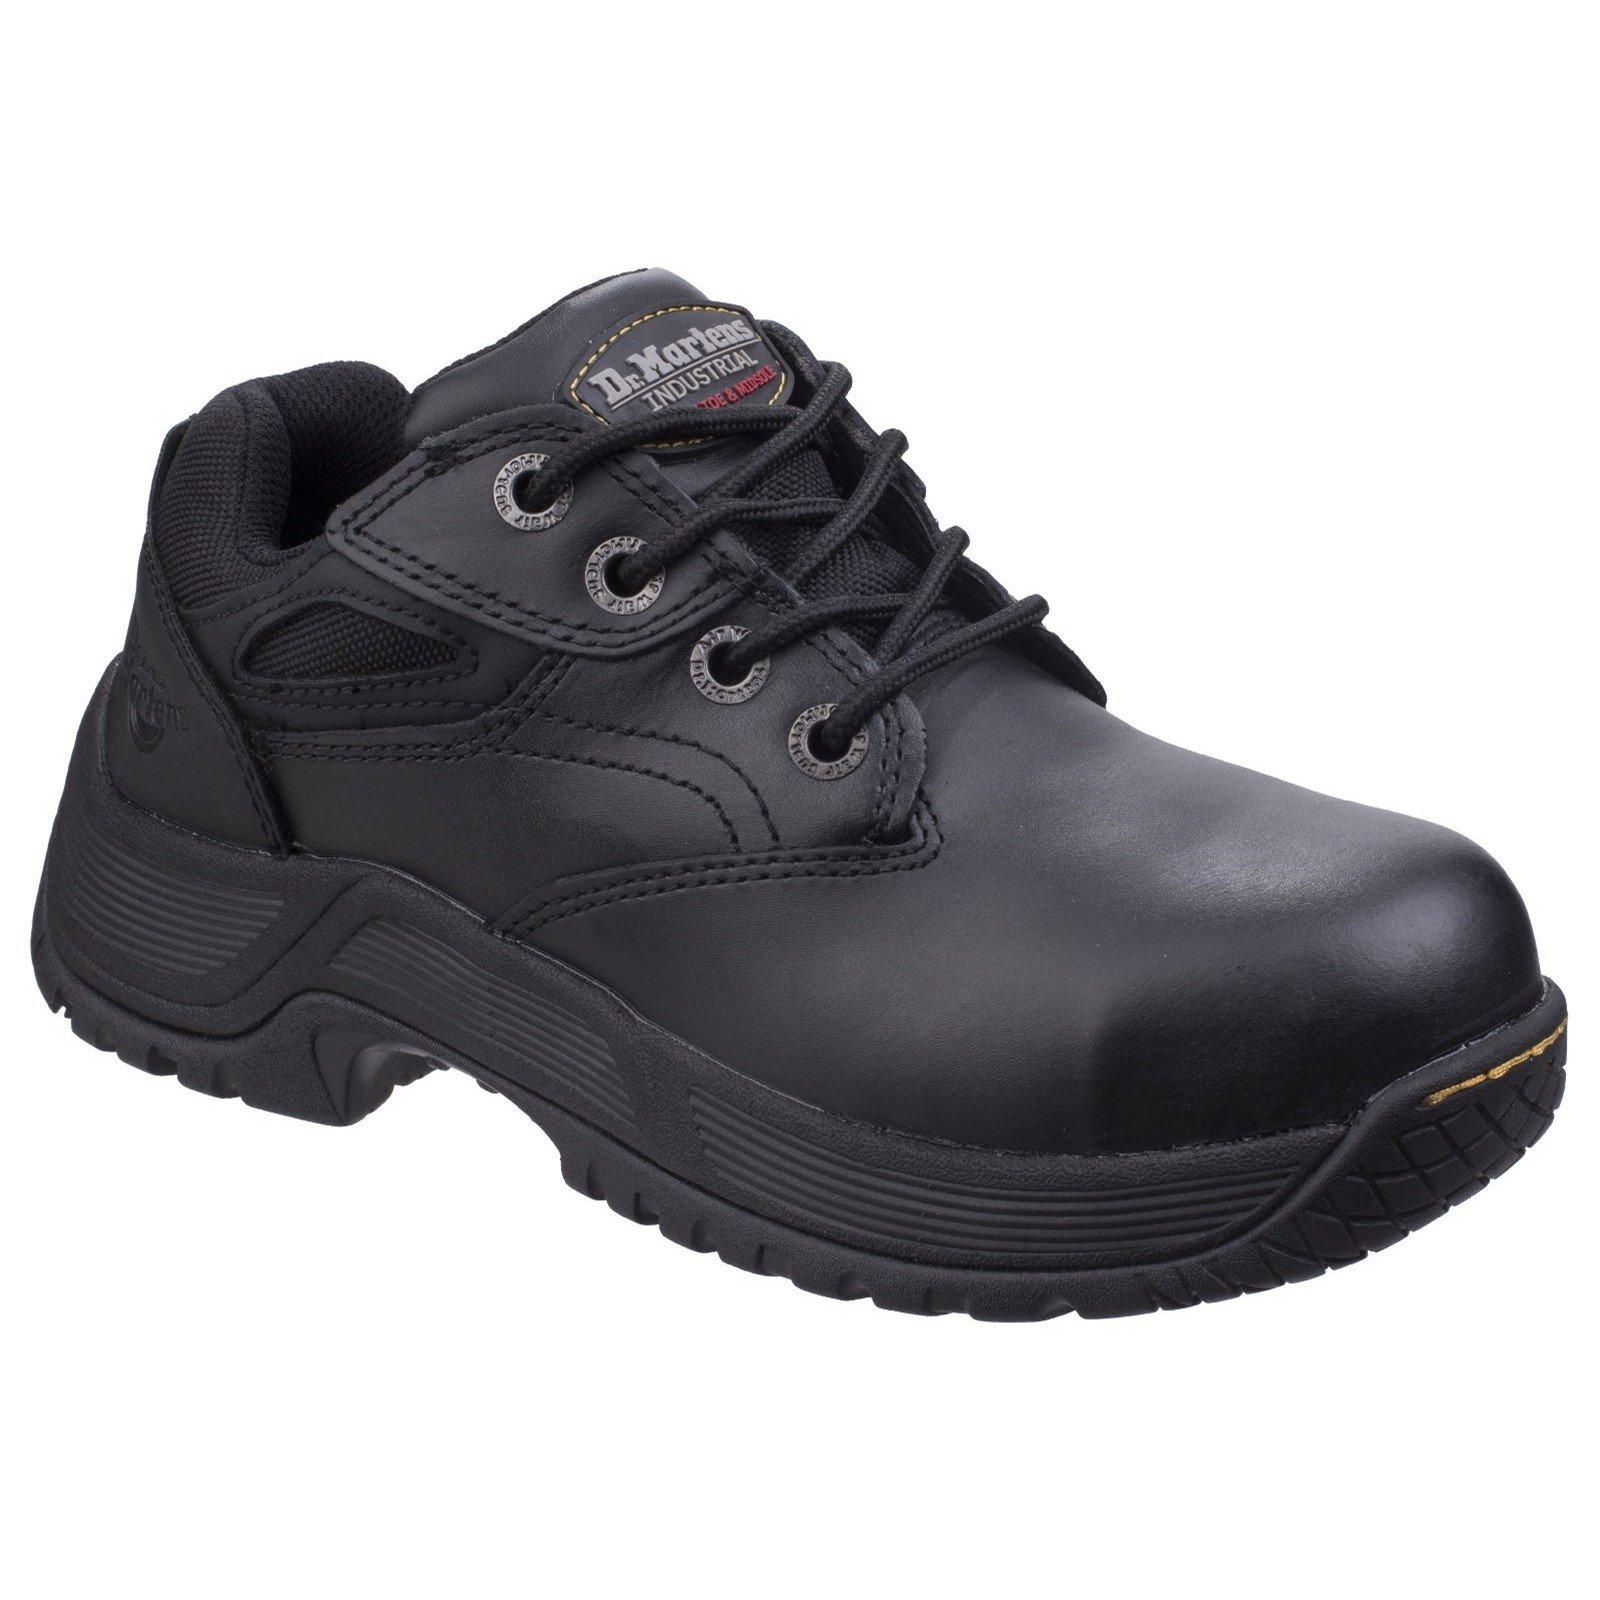 Dr Martens Unisex Calvert Steel Toe Safety Trainer Black 26022 - Black 11